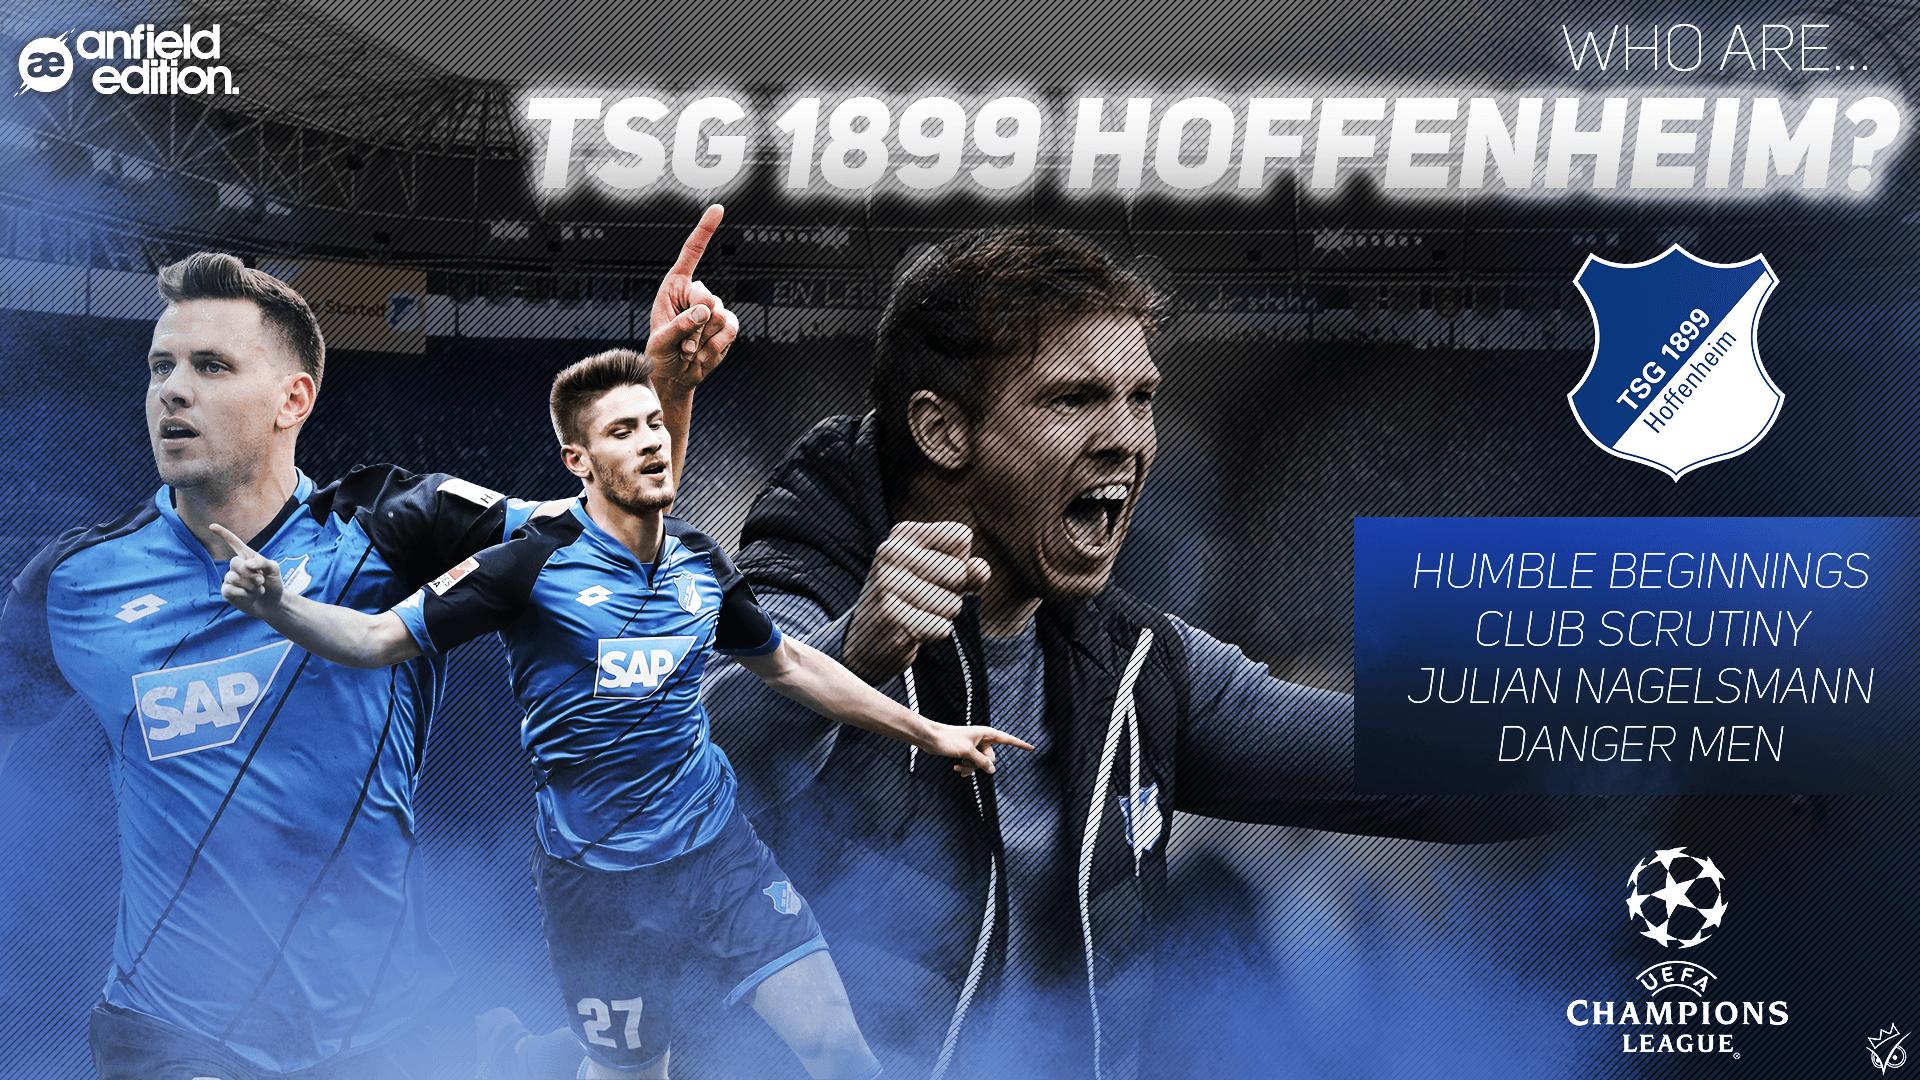 TSG 1899 Hoffenheim Background 8